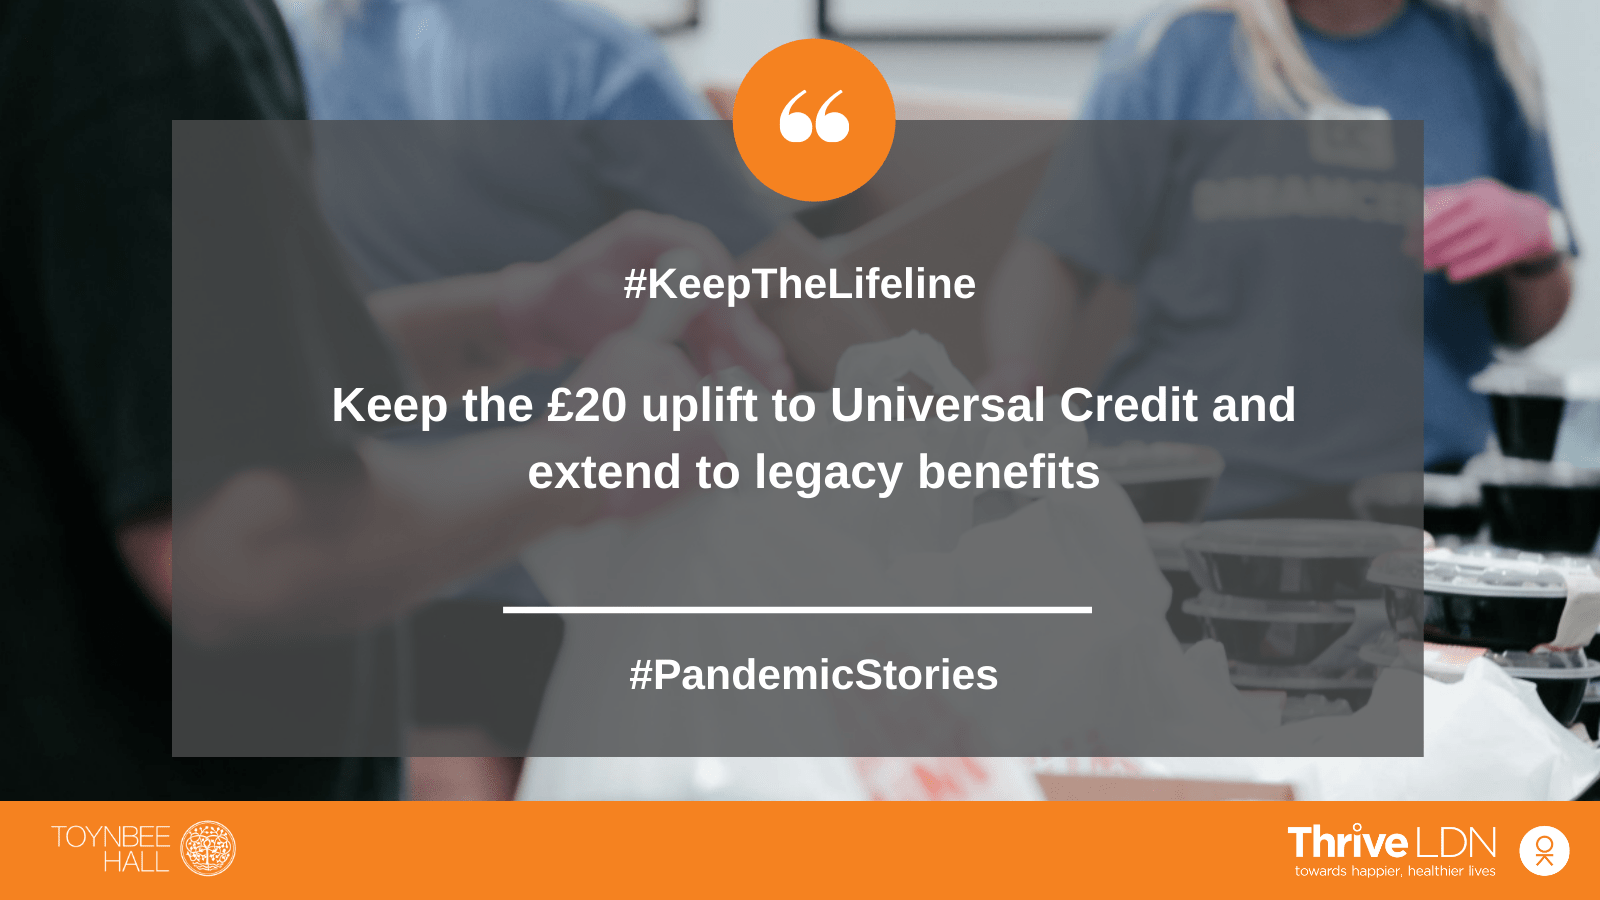 Keep the Lifeline Campaign image